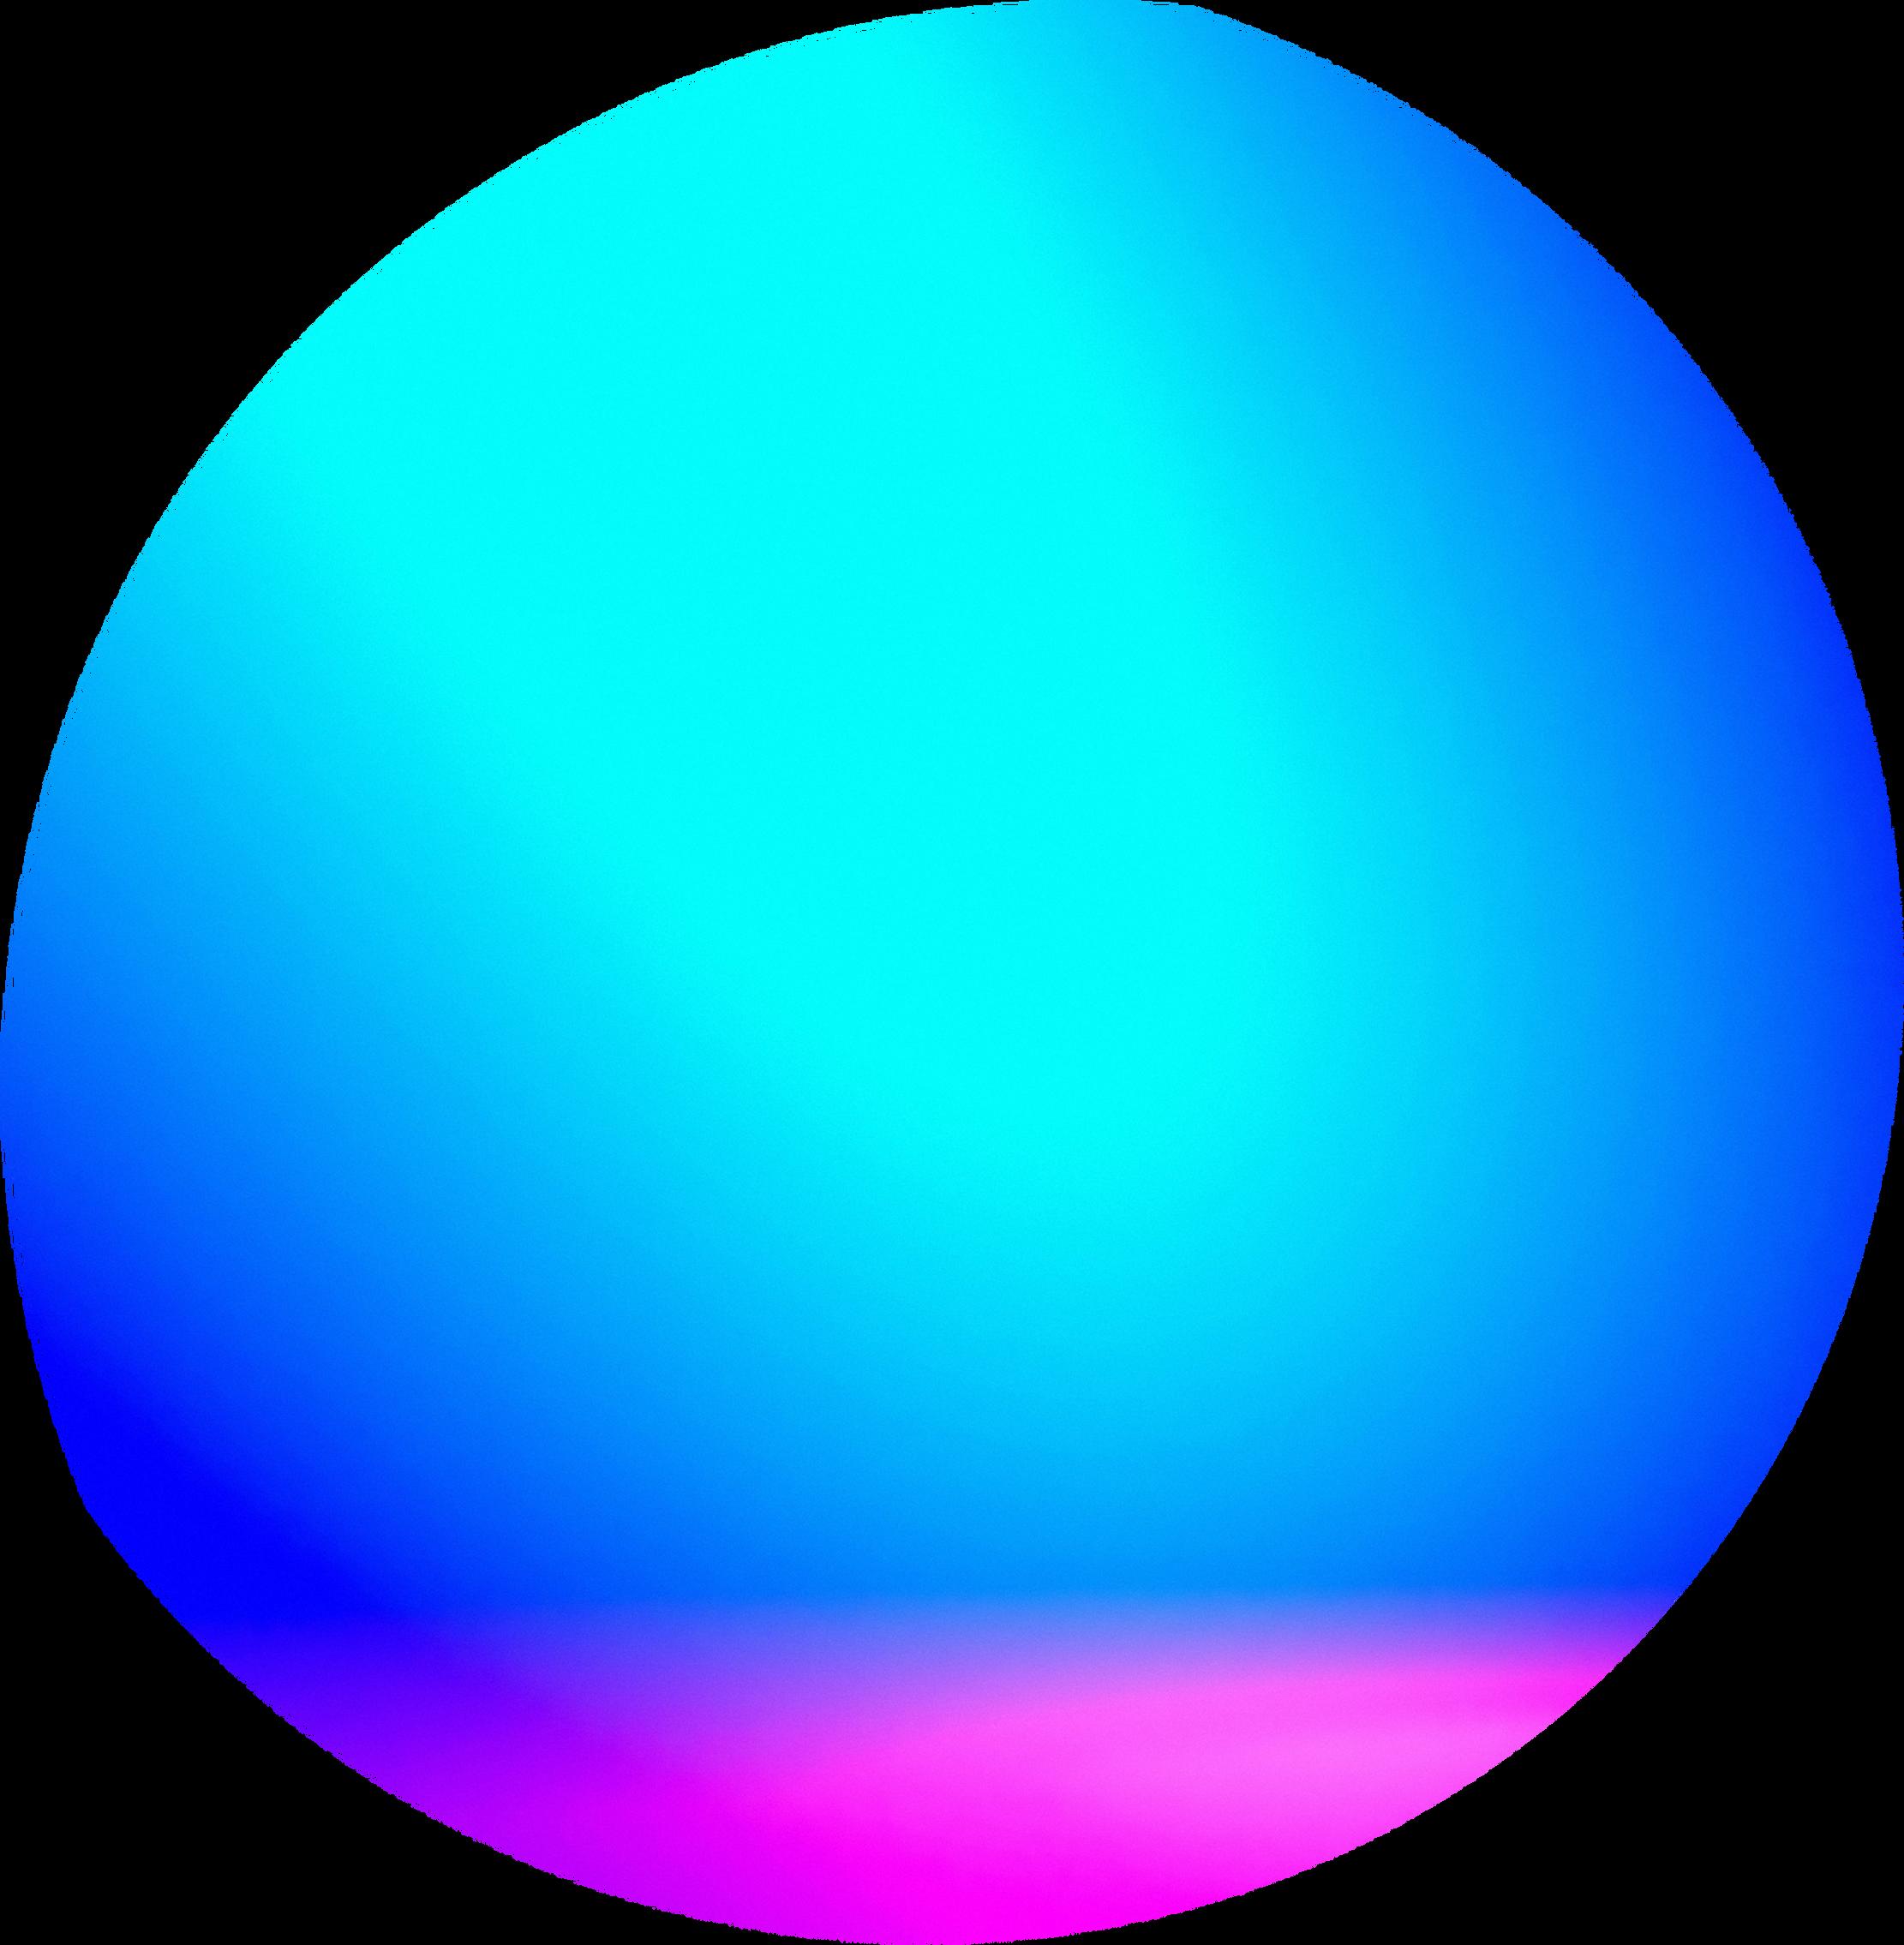 Kuro_Chroma_Grainy_Gradients_Abstract_Shapes_01.png